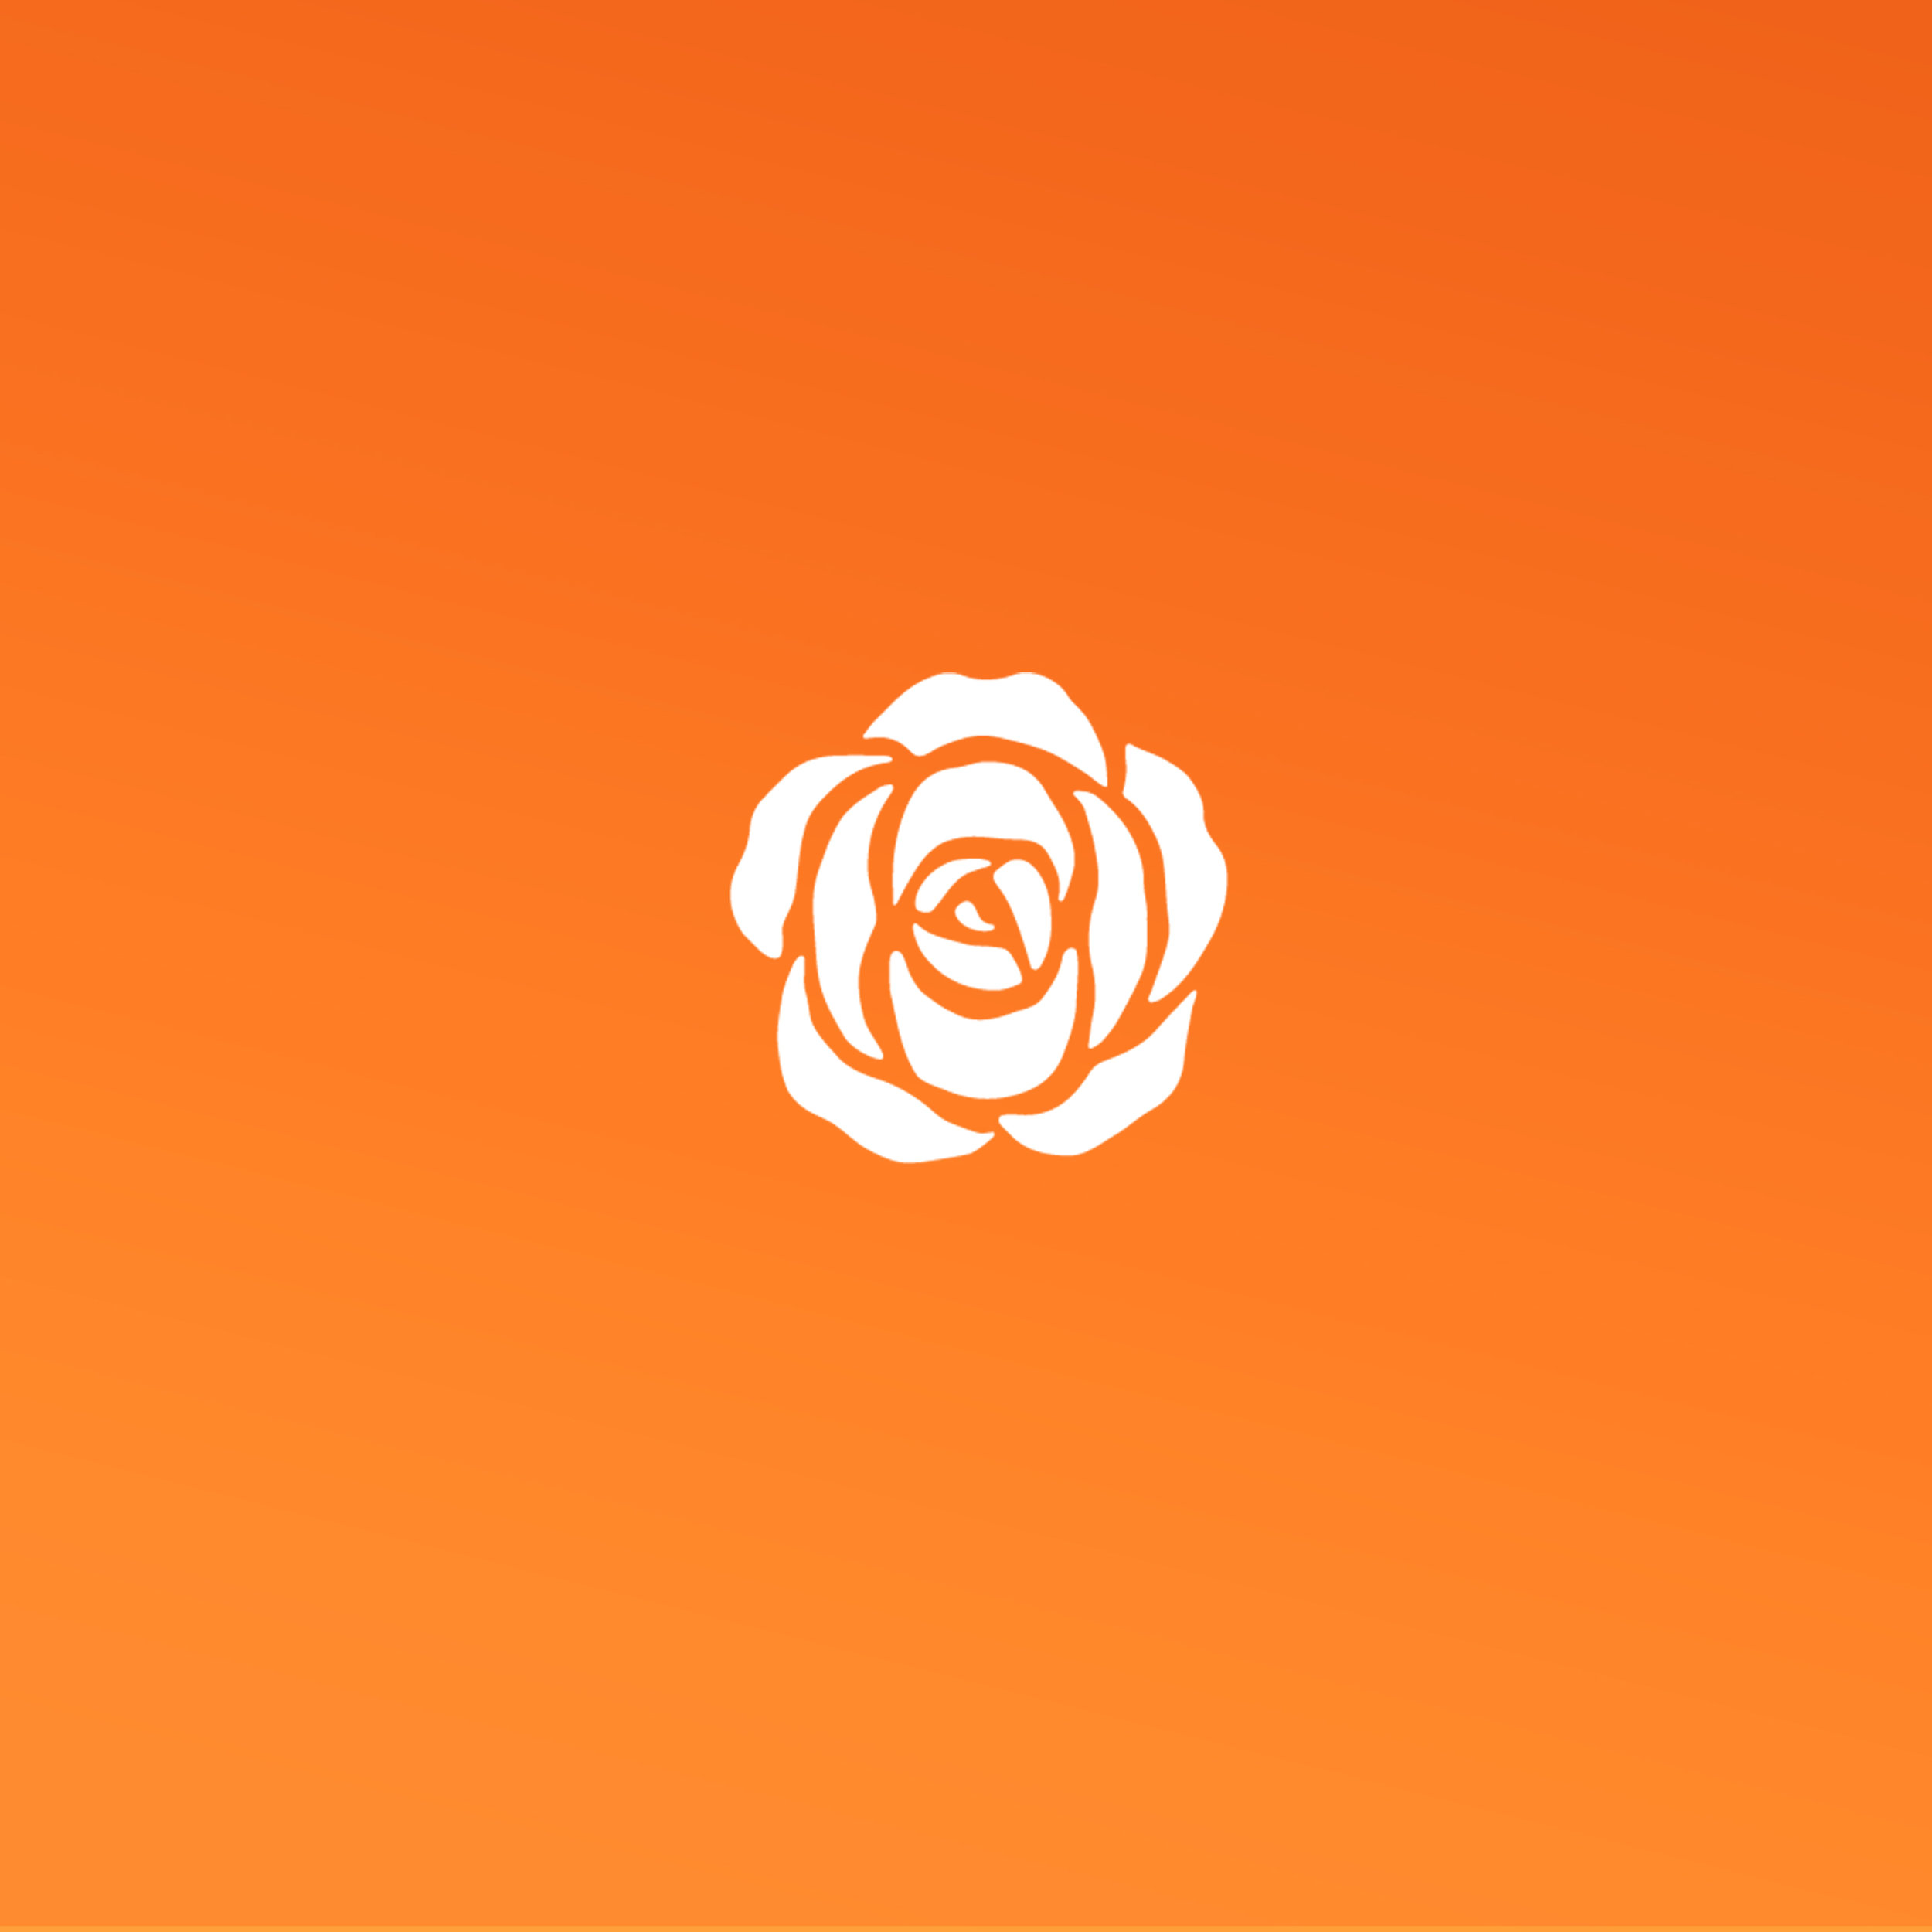 White-on-Orange-SQUARE.jpg